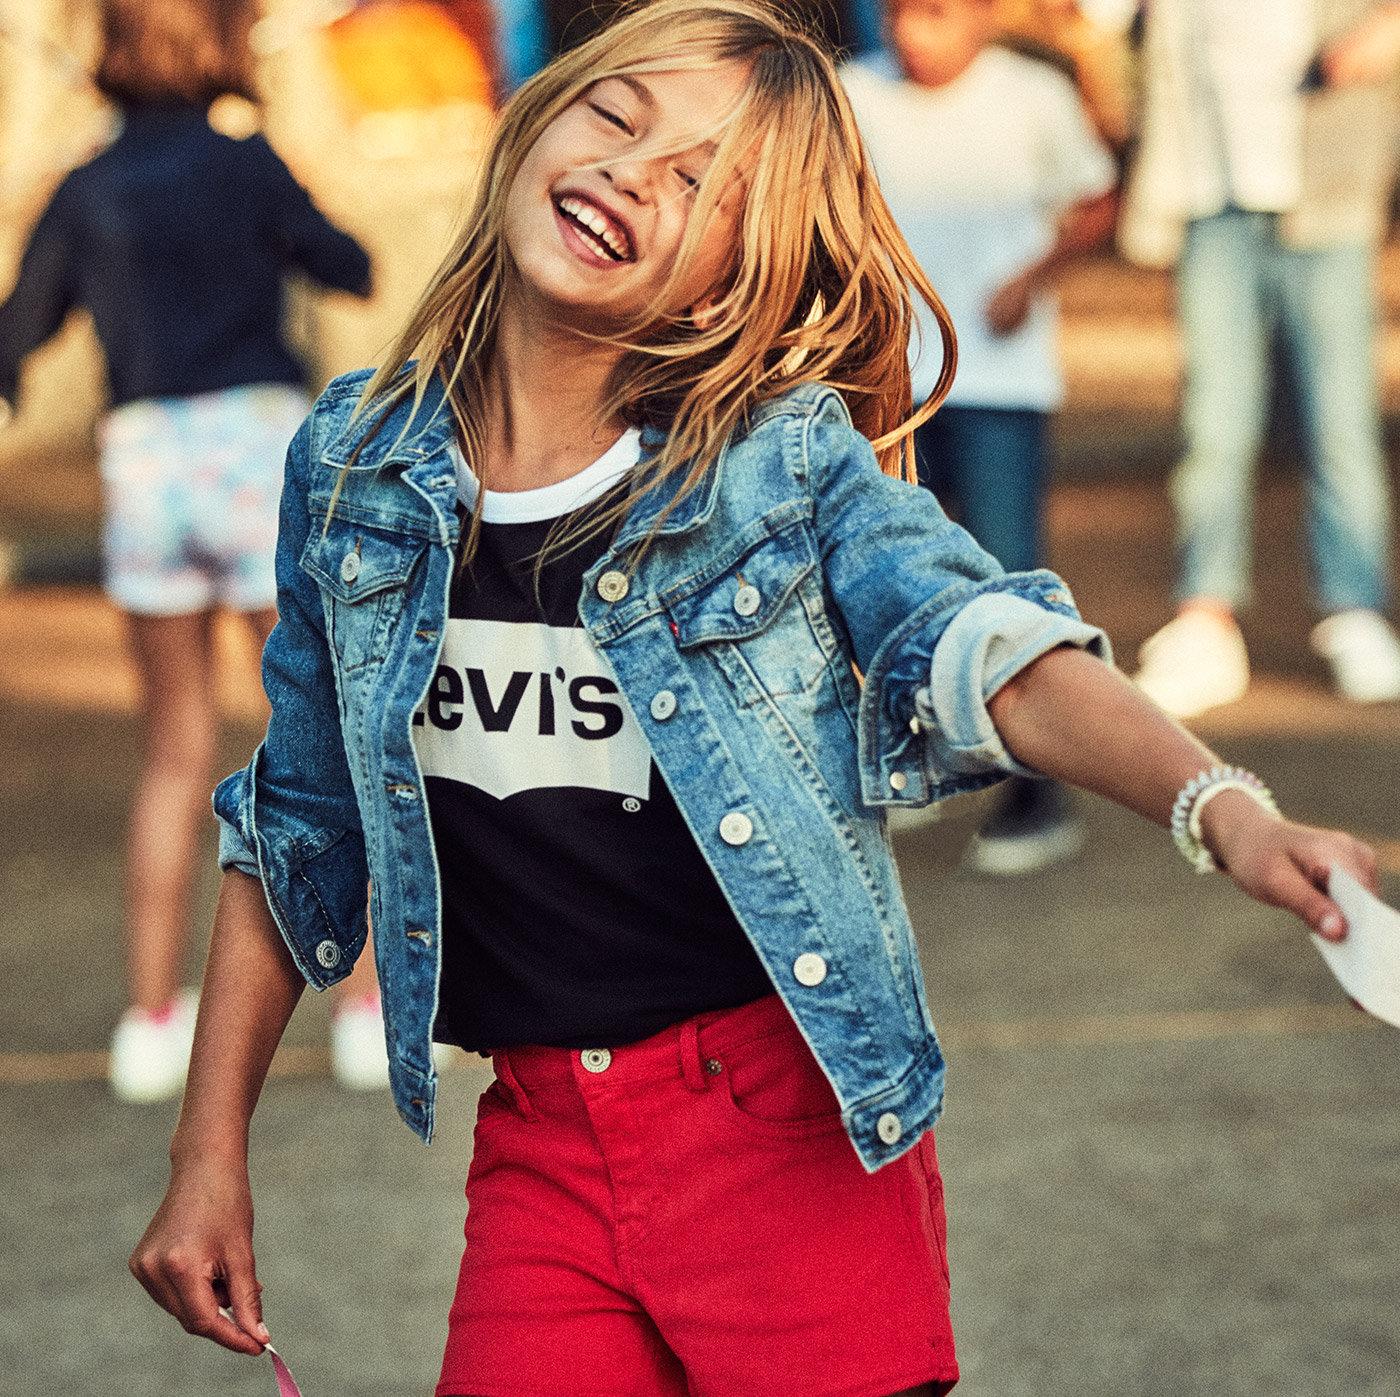 Girl wearing levis Jeans